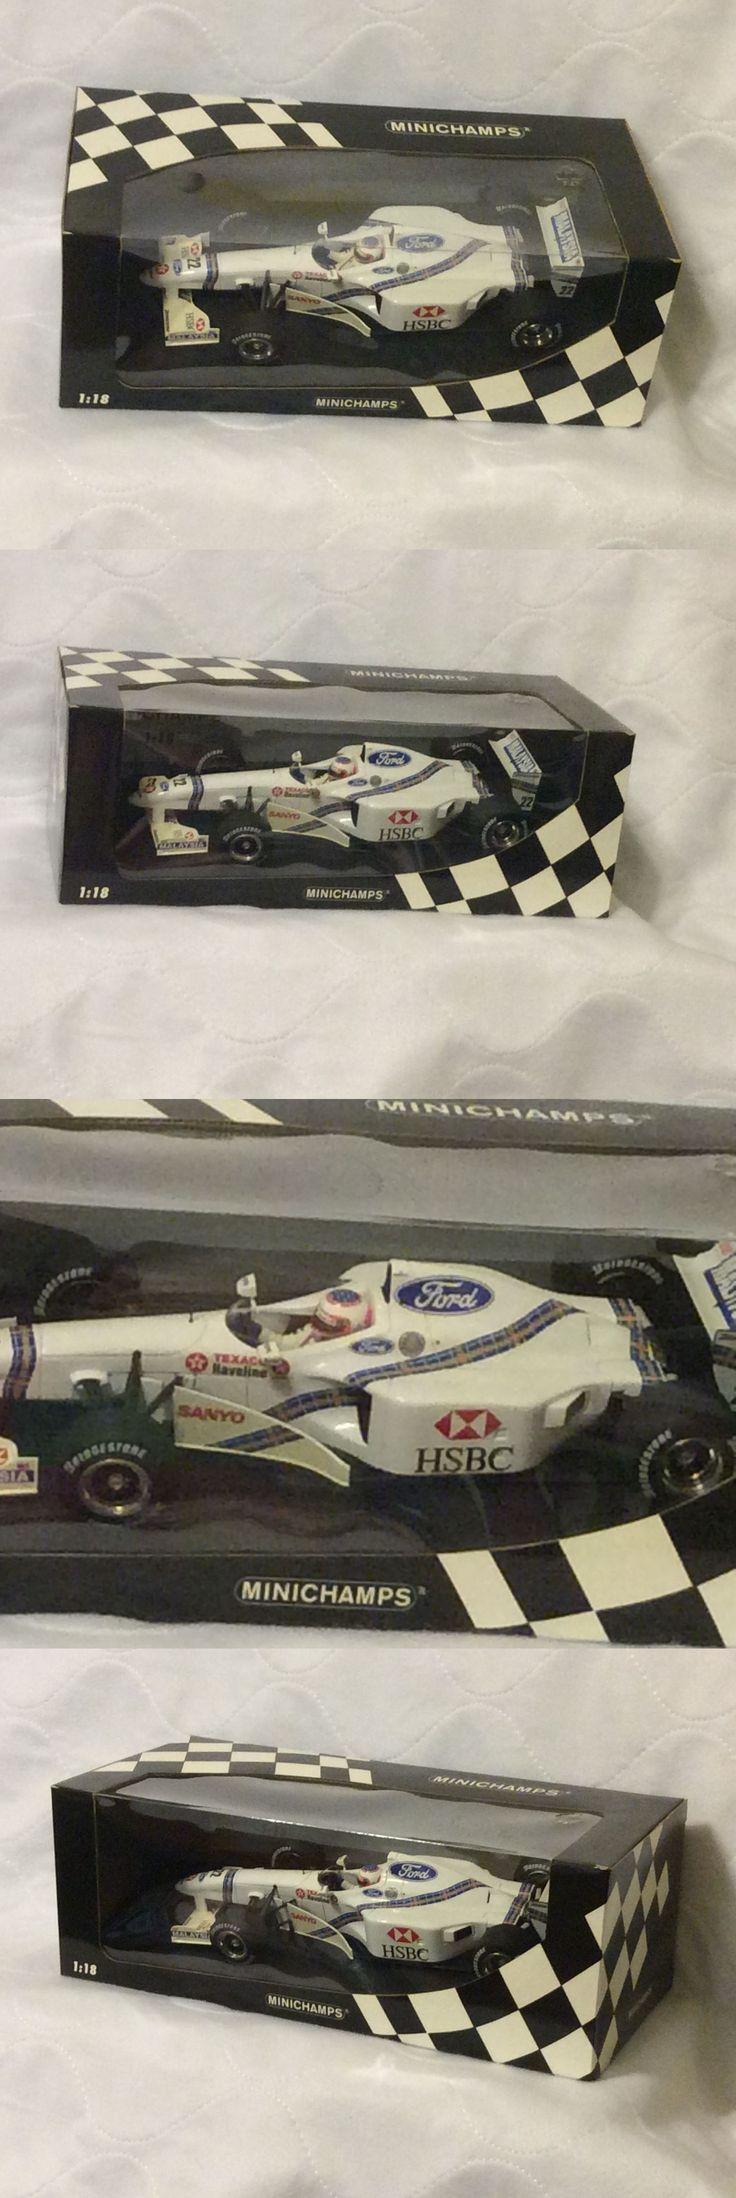 Formula 1 Cars 180270: Minichamps 1:18 Scale 1997 Rubens Barrichello Stewart Ford Sf-1 Diecast F1 Car -> BUY IT NOW ONLY: $139.95 on eBay!